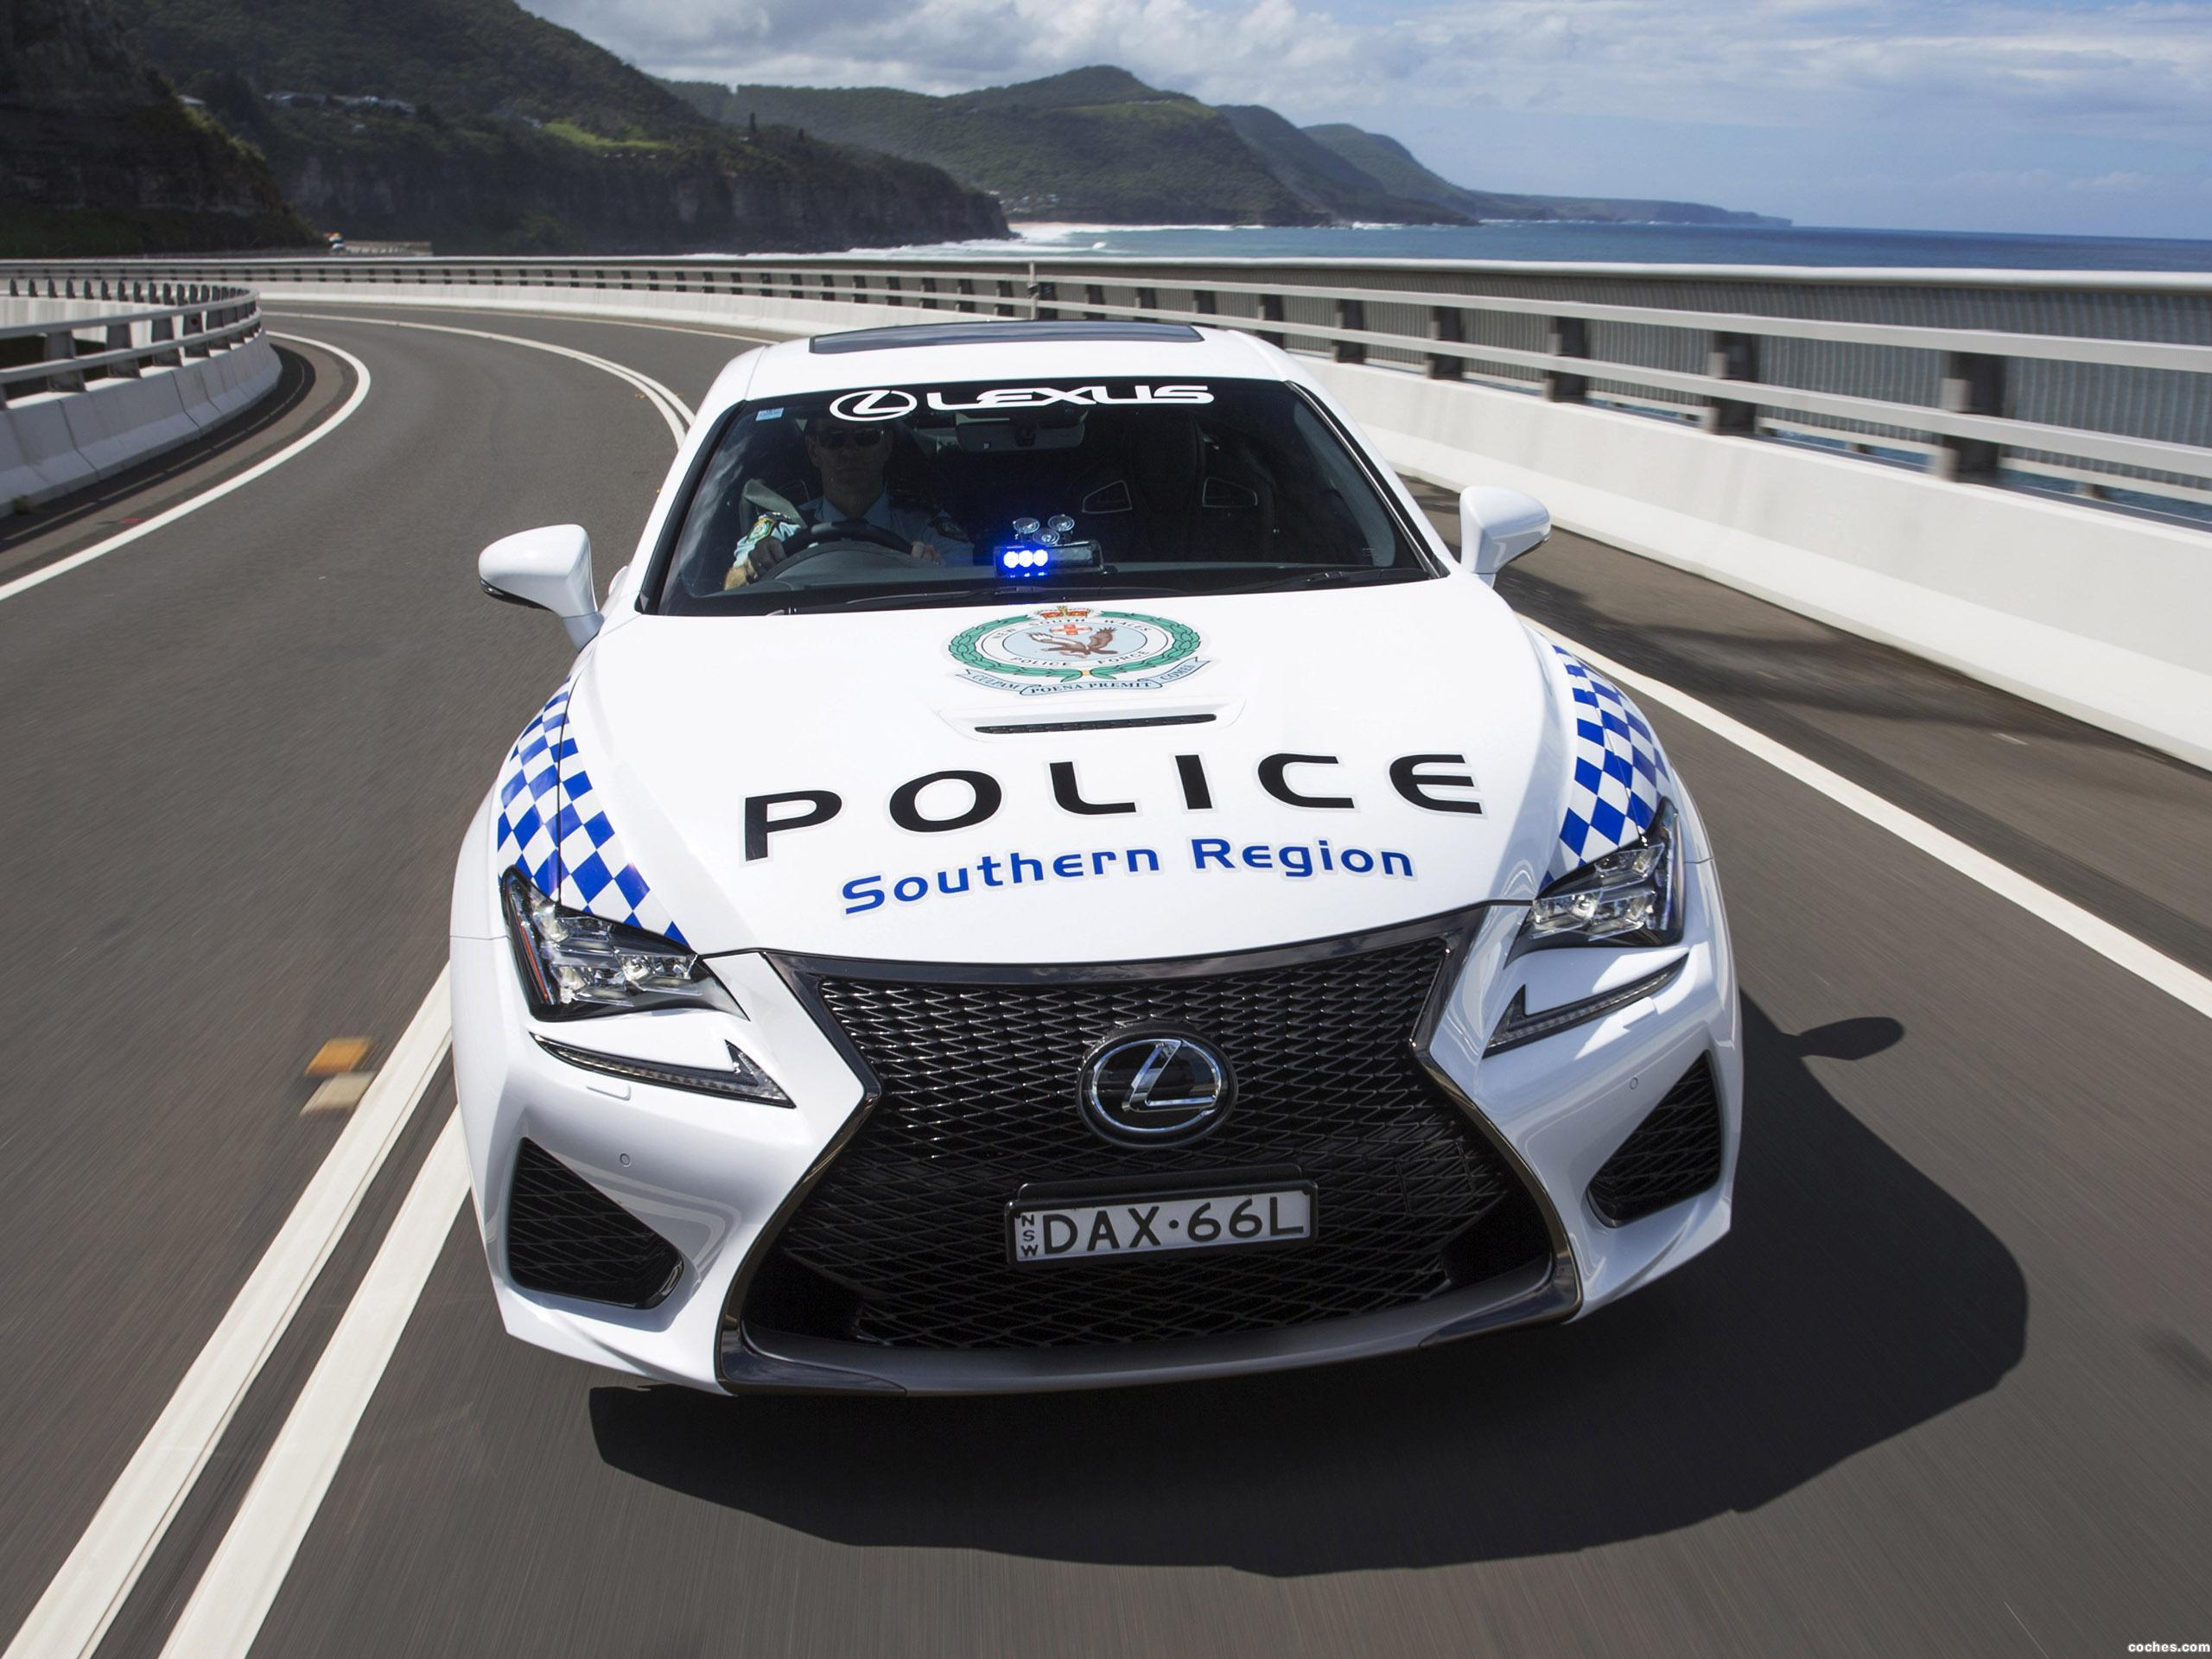 Foto 1 de Lexus RC-F Police Car Australia 2016